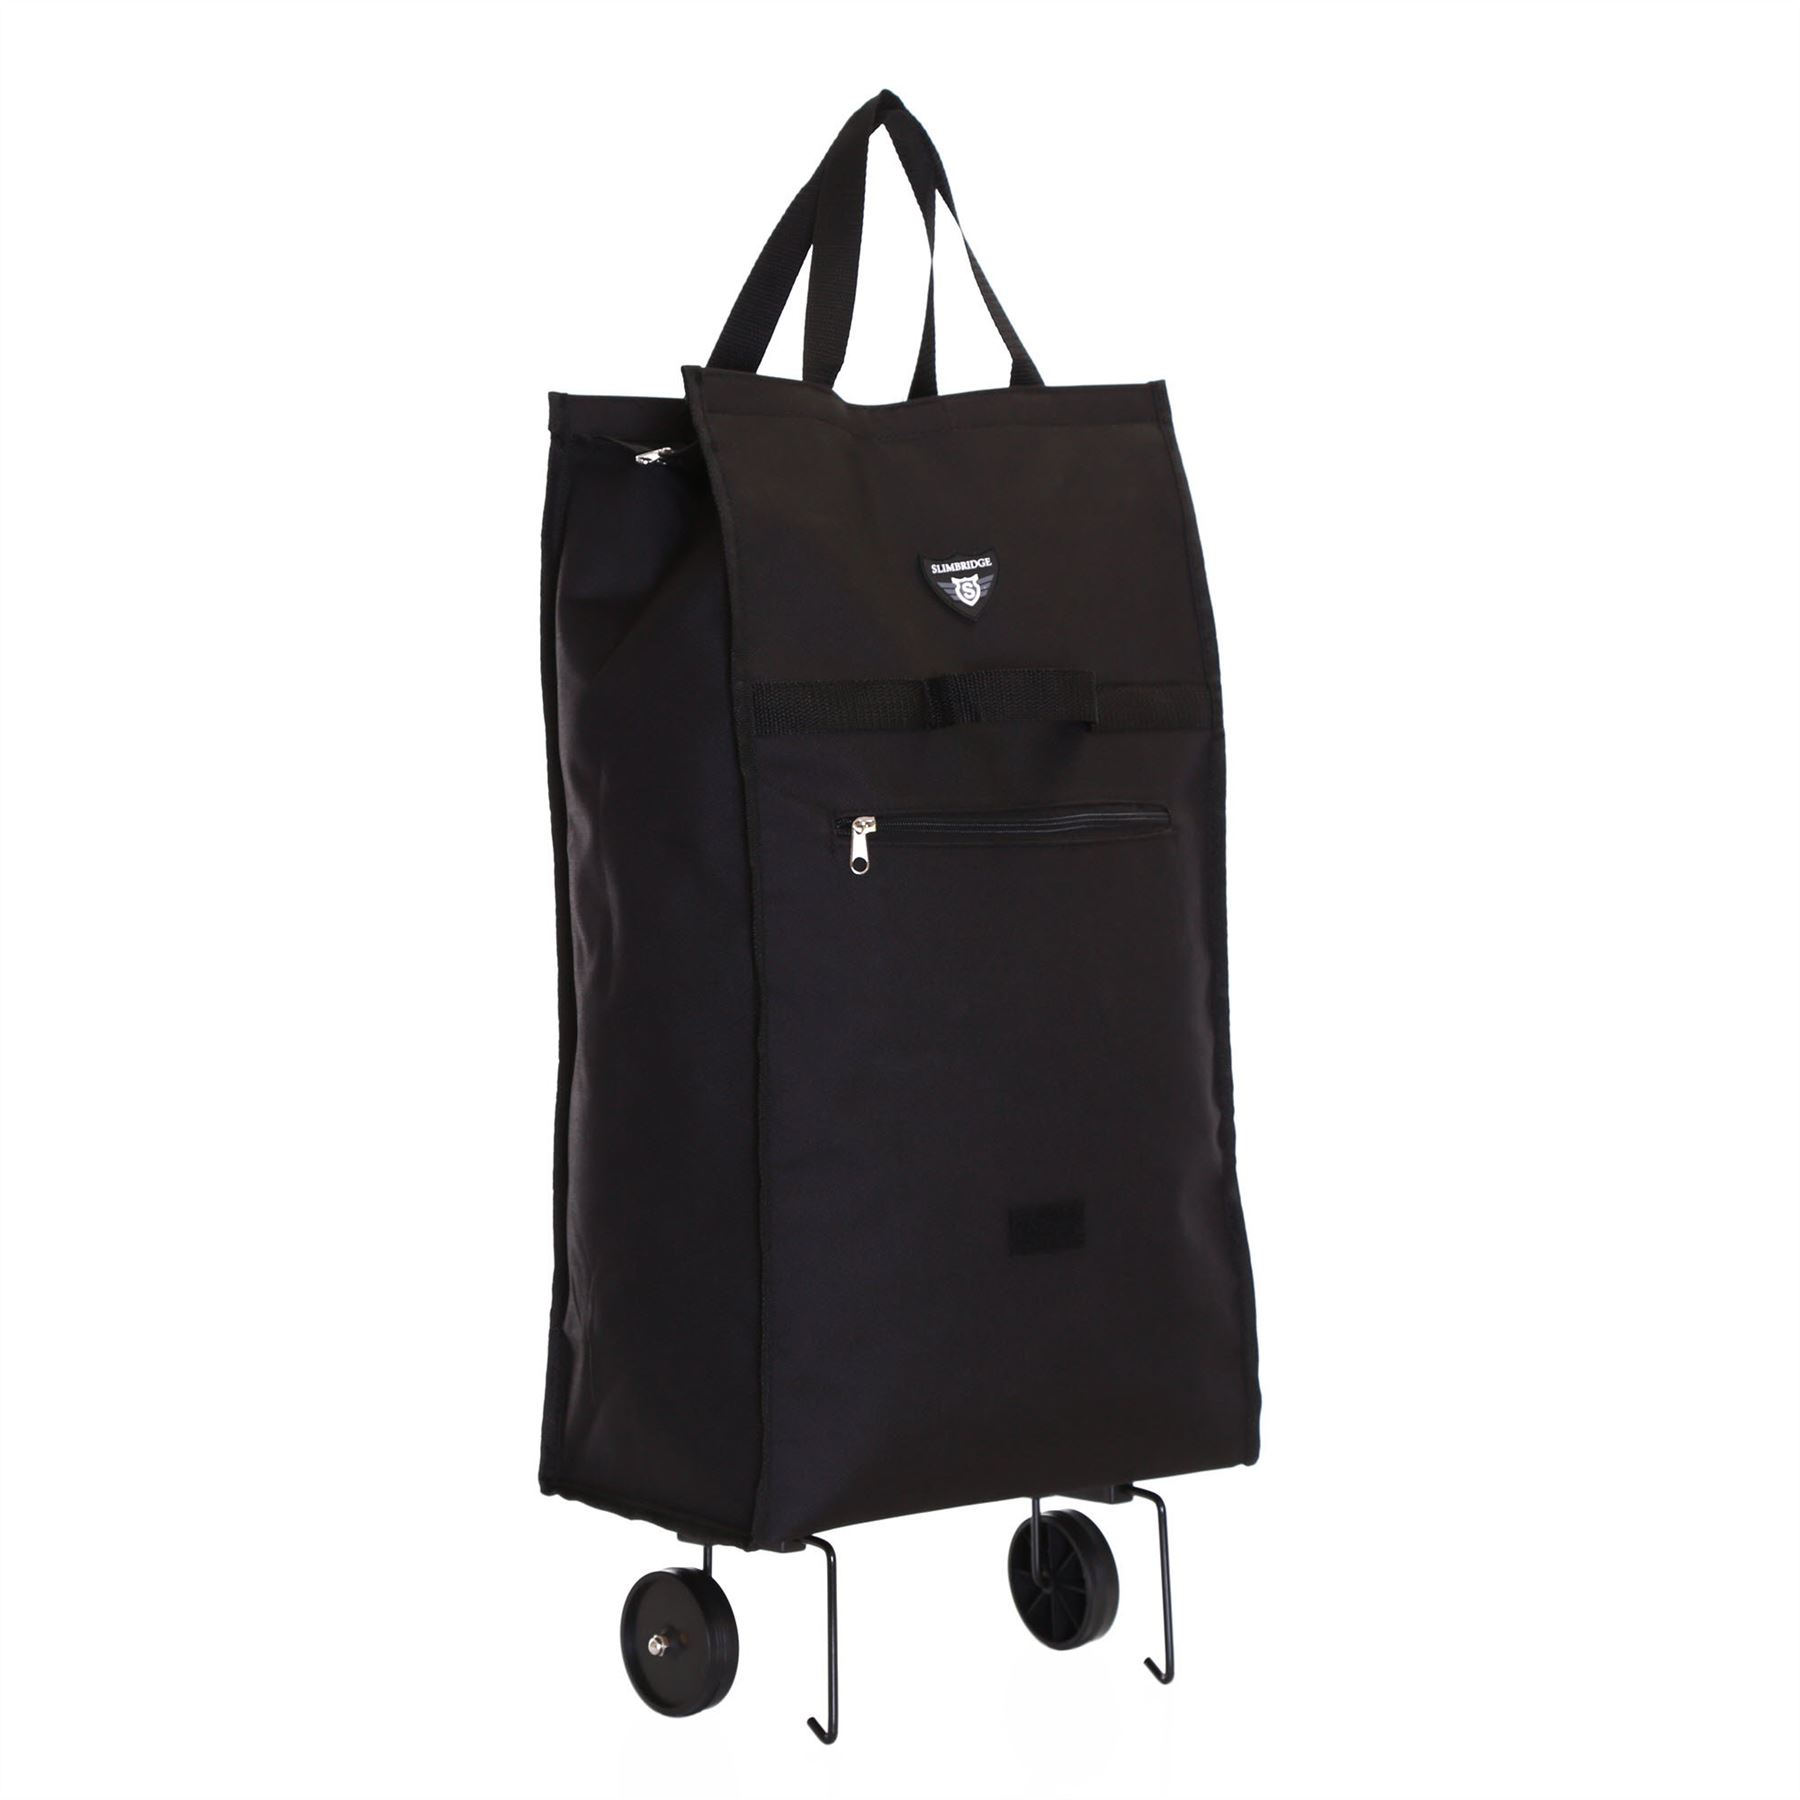 foldable folding wheeled wheels shopping shopper luggage travel trolley bag ebay. Black Bedroom Furniture Sets. Home Design Ideas